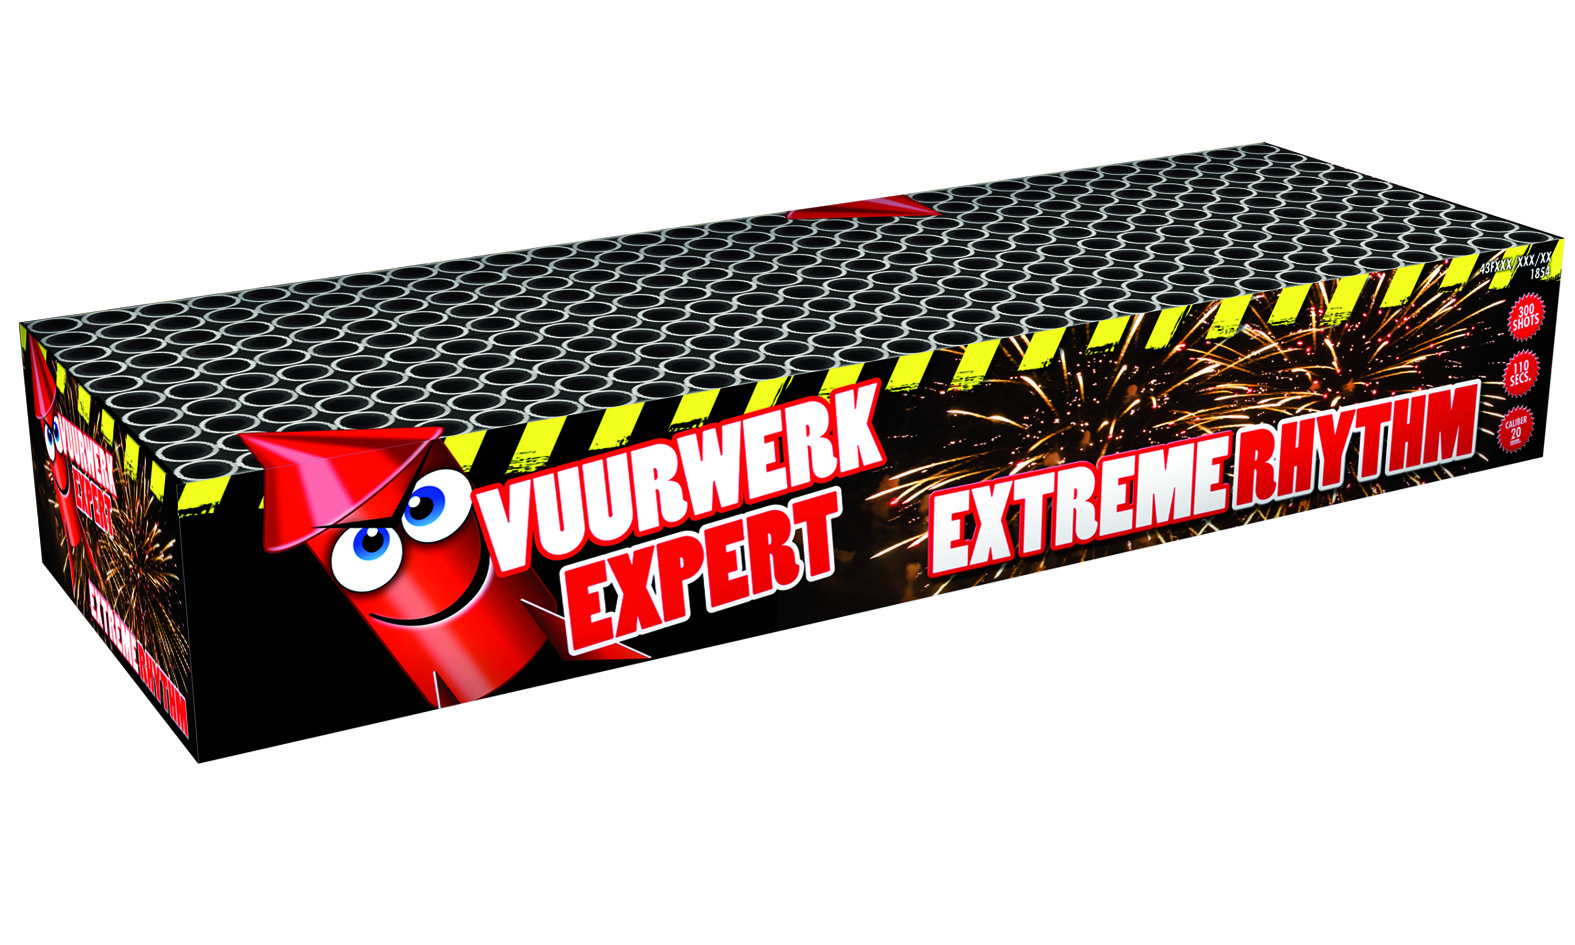 Extreme Rhythm